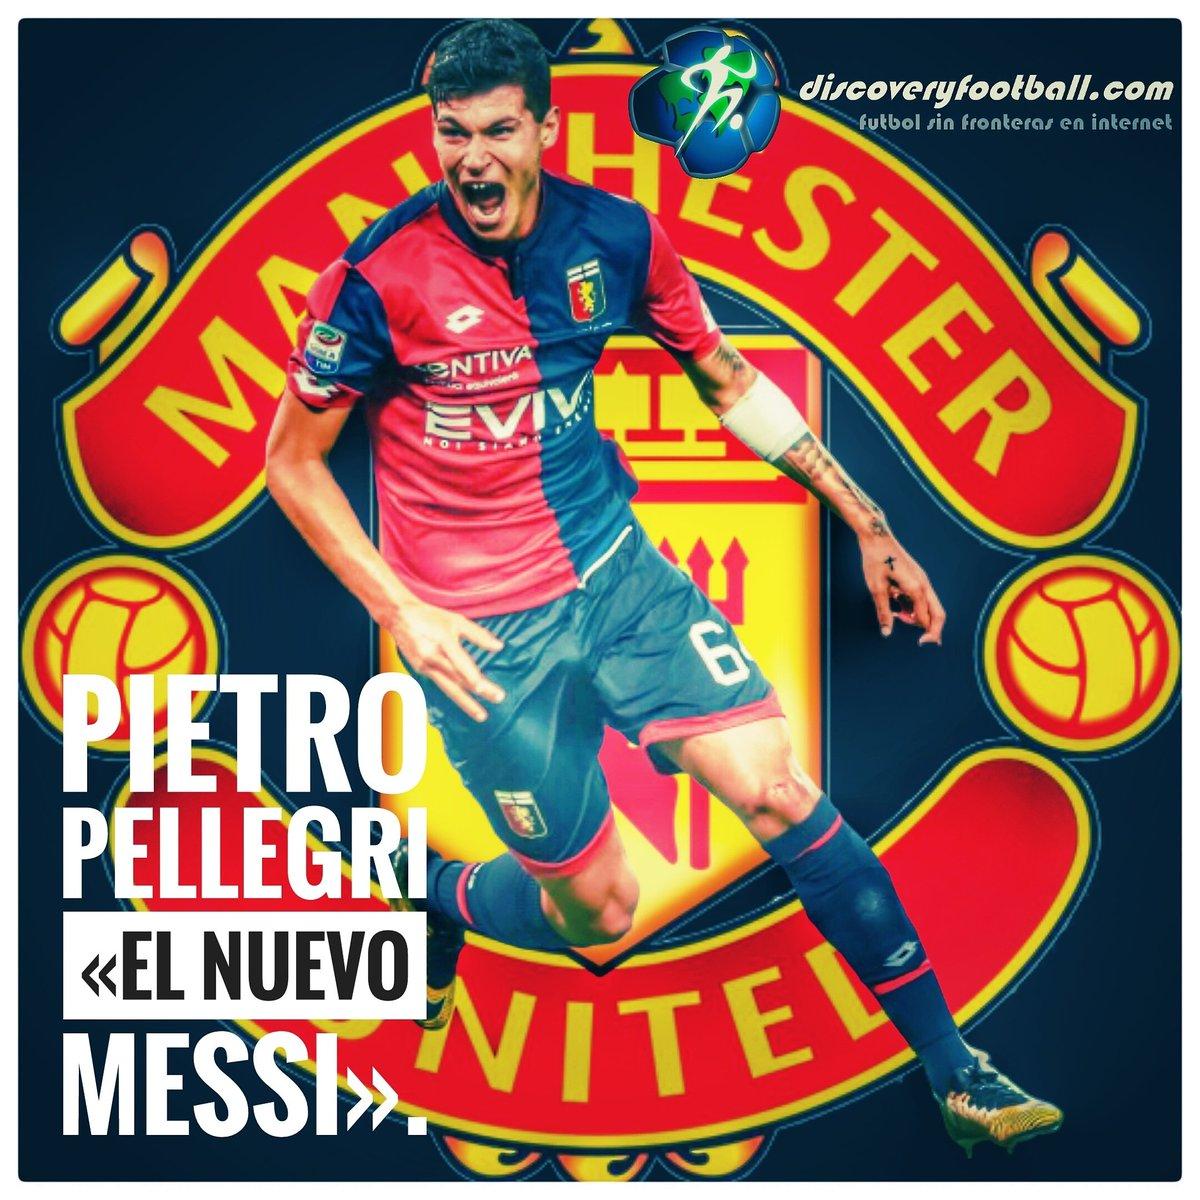 "El @ManUtd está muy cerca de bloquear al «Nuevo Messi». Pietro Pellegri  Jugará con ""The Mancunians""?. @AS_Monaco #ItaliaSi #forzaitalia🇮🇹 #ManchesterUnited #talento #futbol #crack #manunited #discoveryfootball #asmonaco https://t.co/h2WOpheuZg"